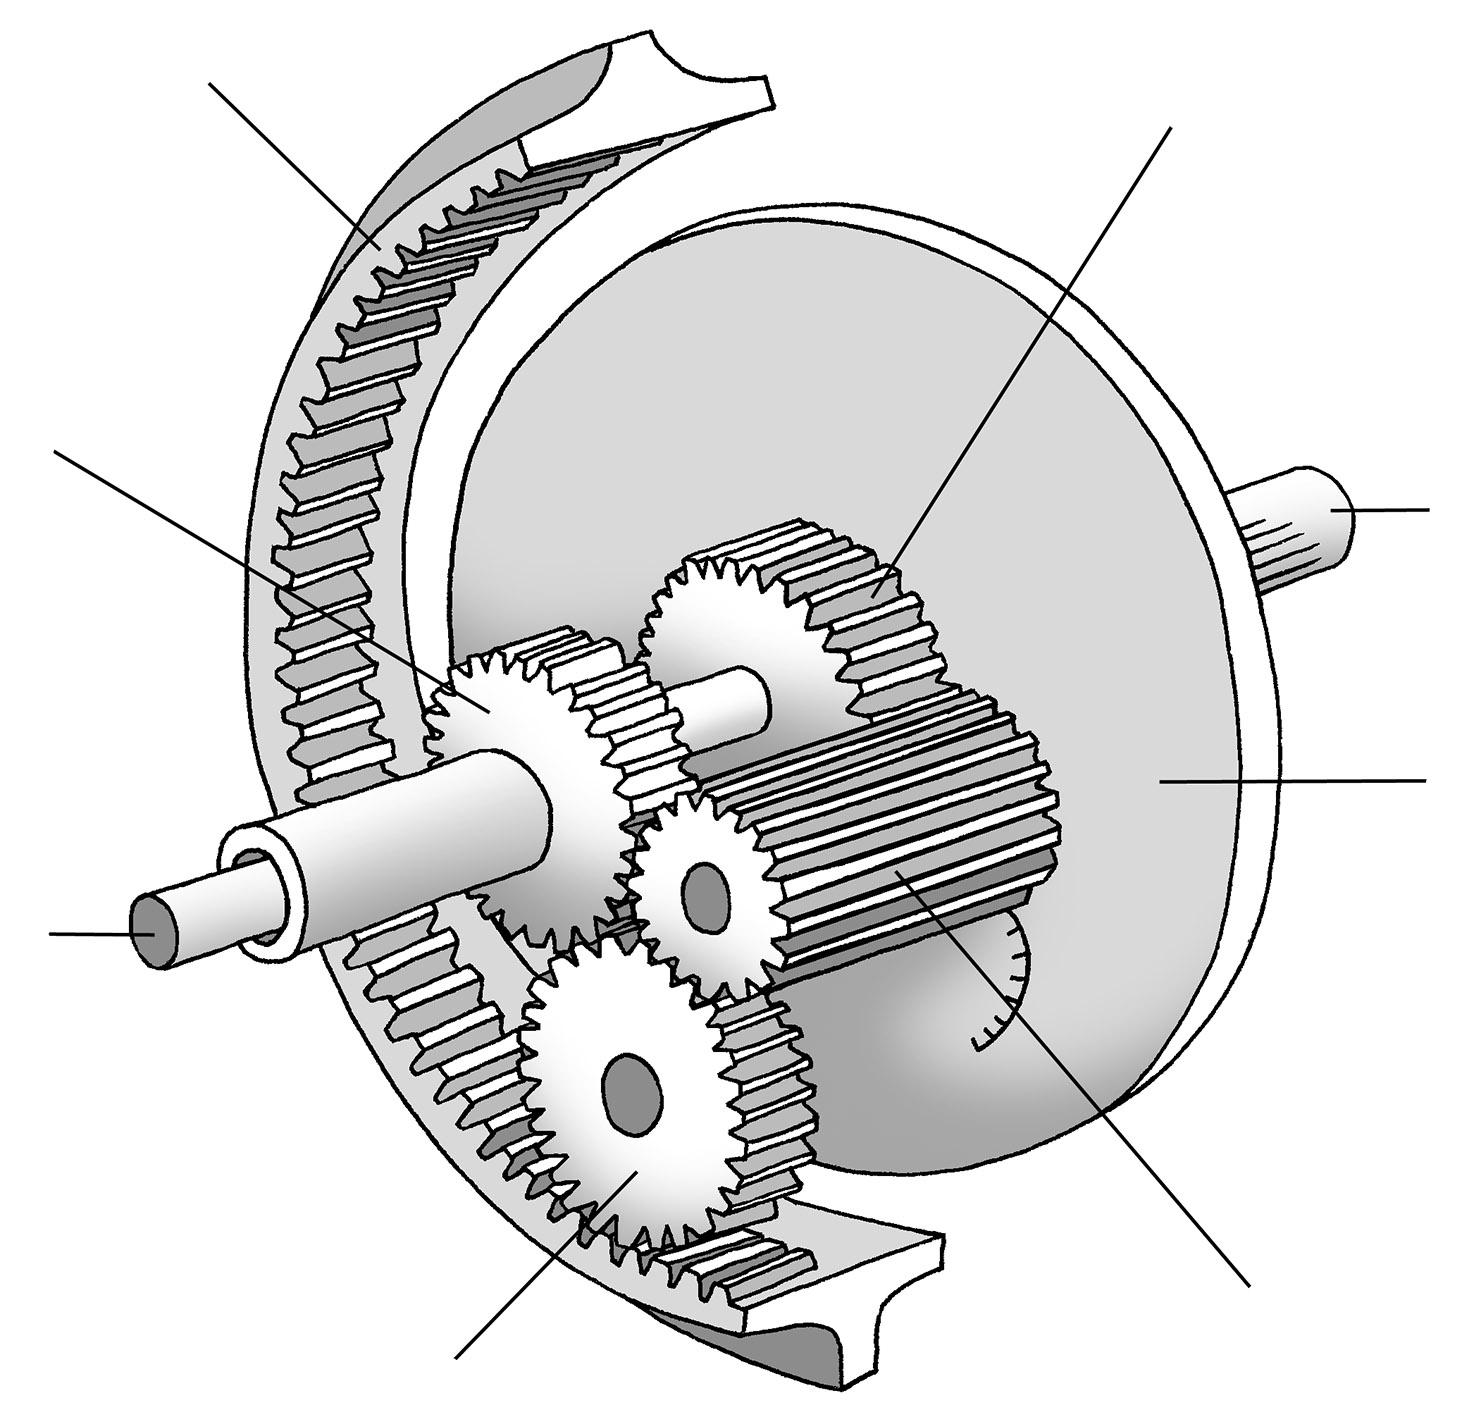 hight resolution of epicyclic gear train